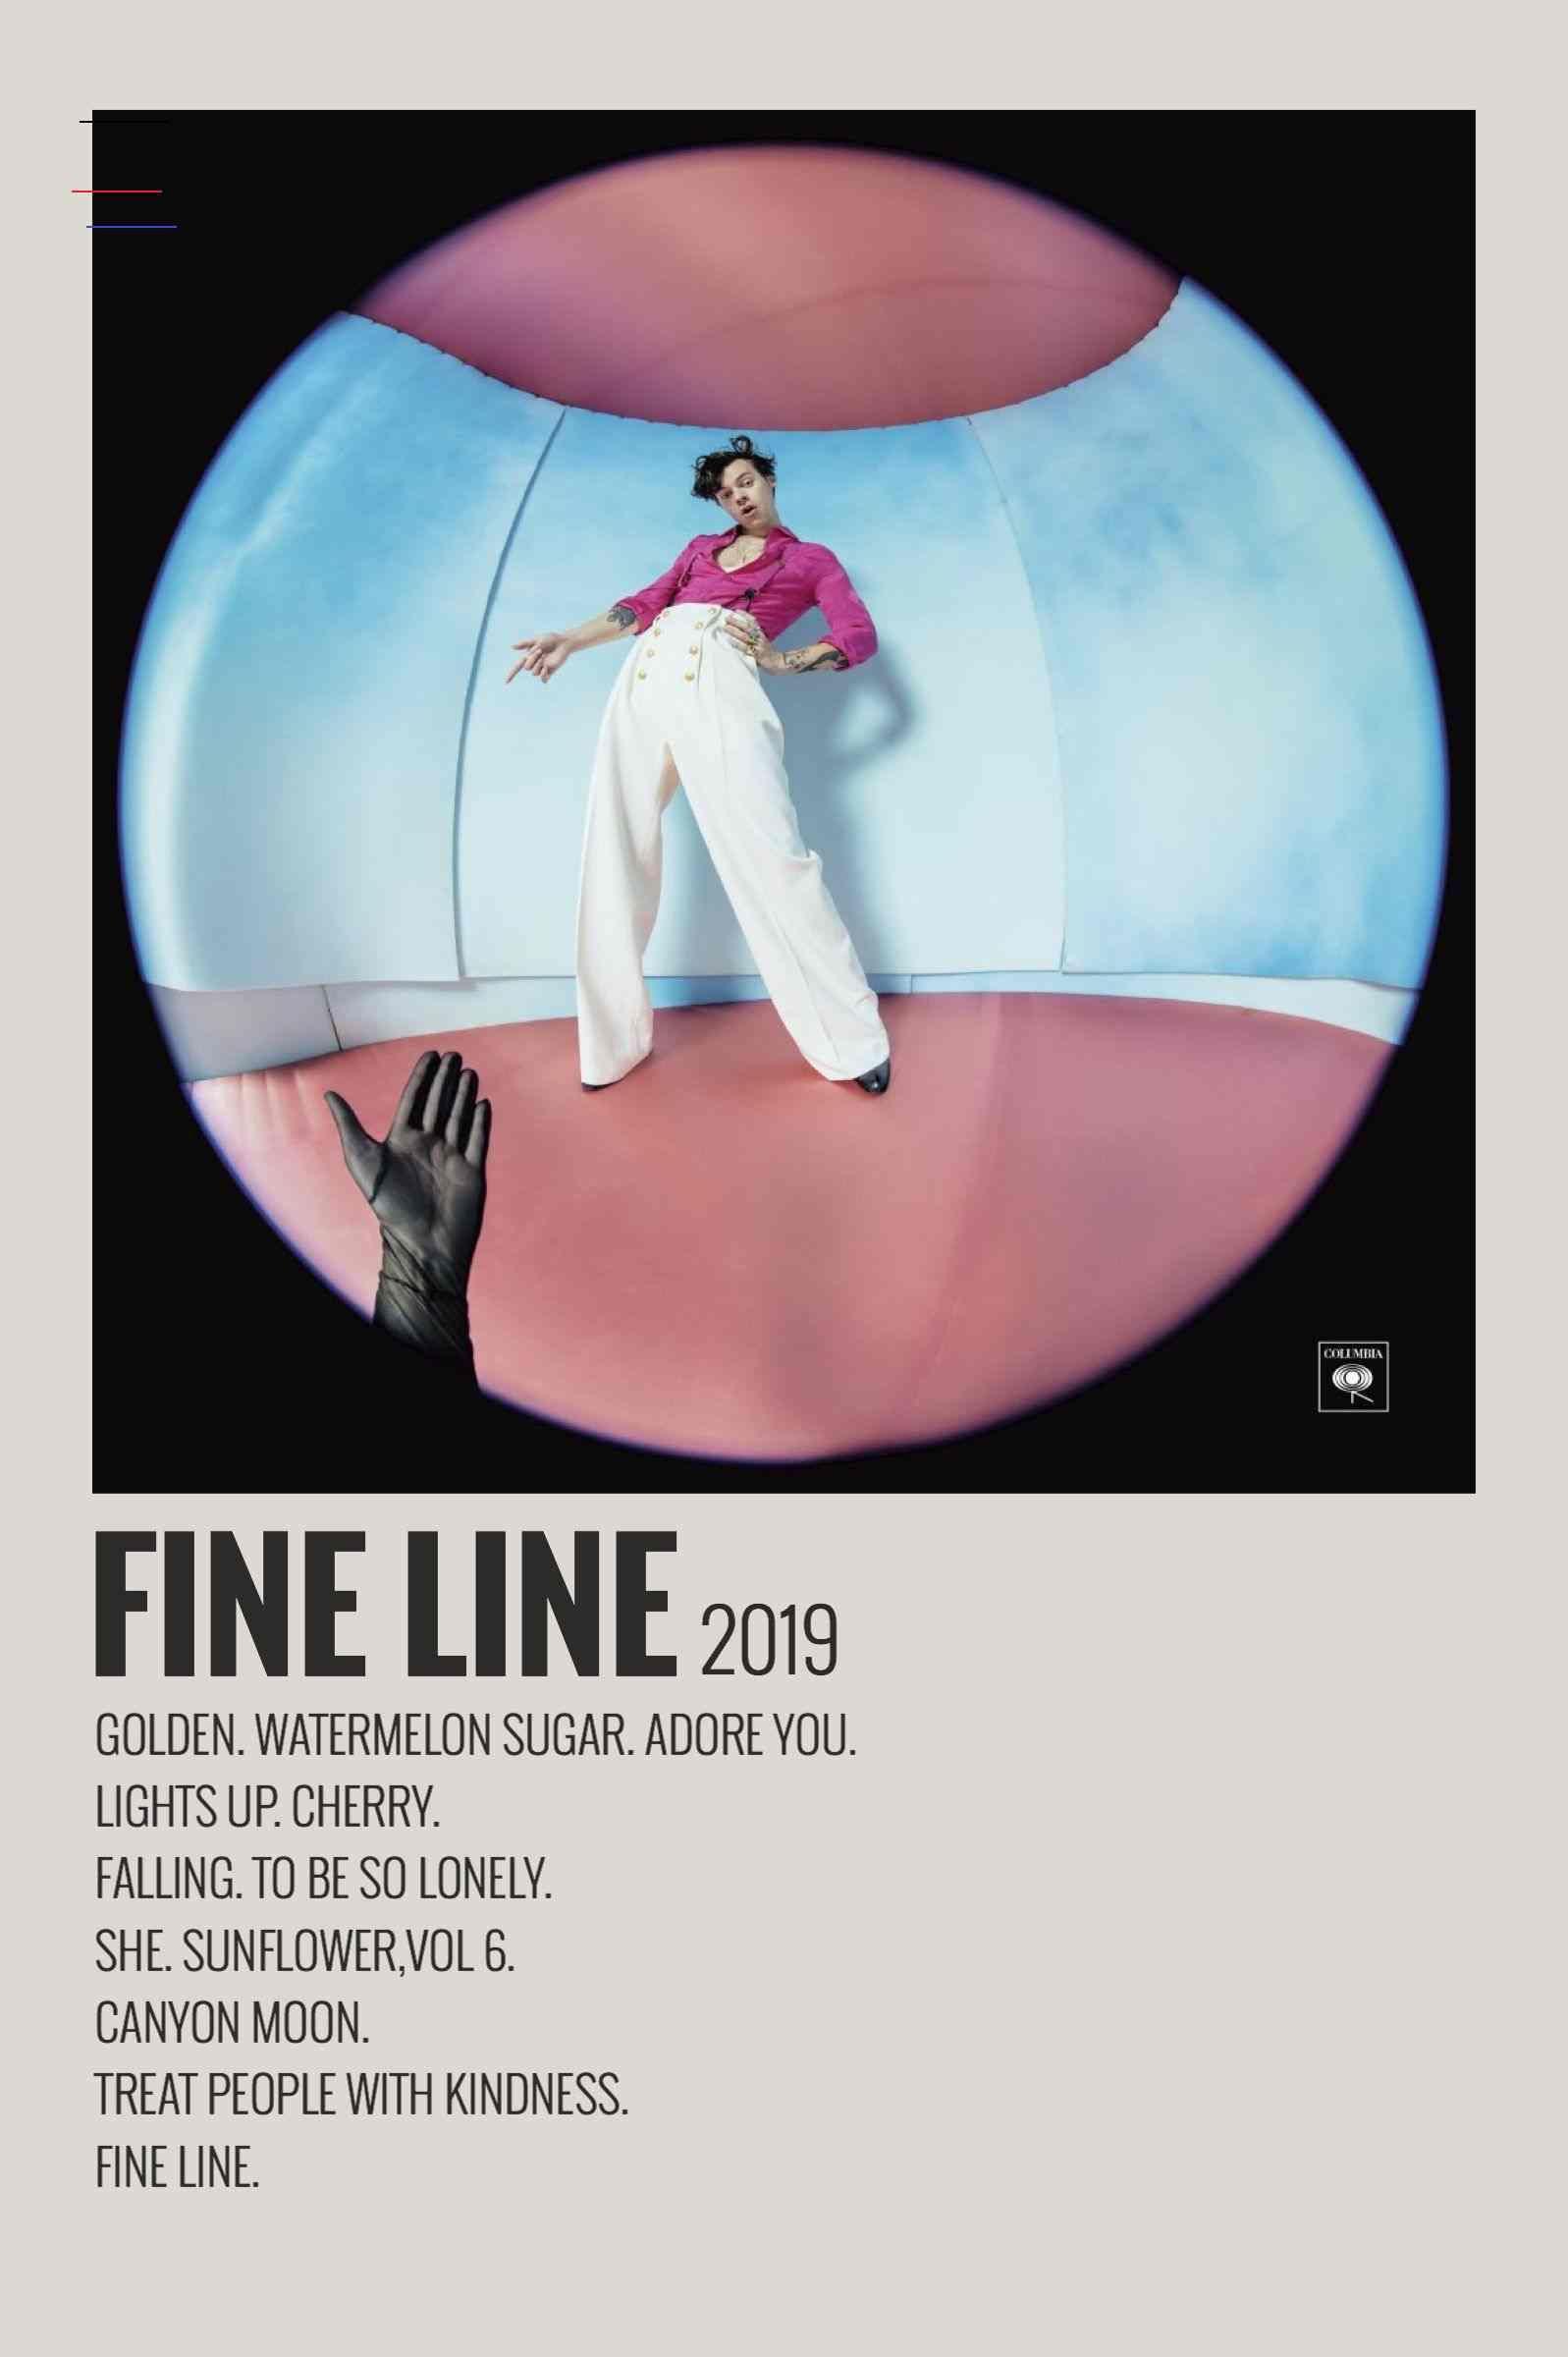 Alternative Minimalist Music Album Poster - Fine Line by Harry Styles